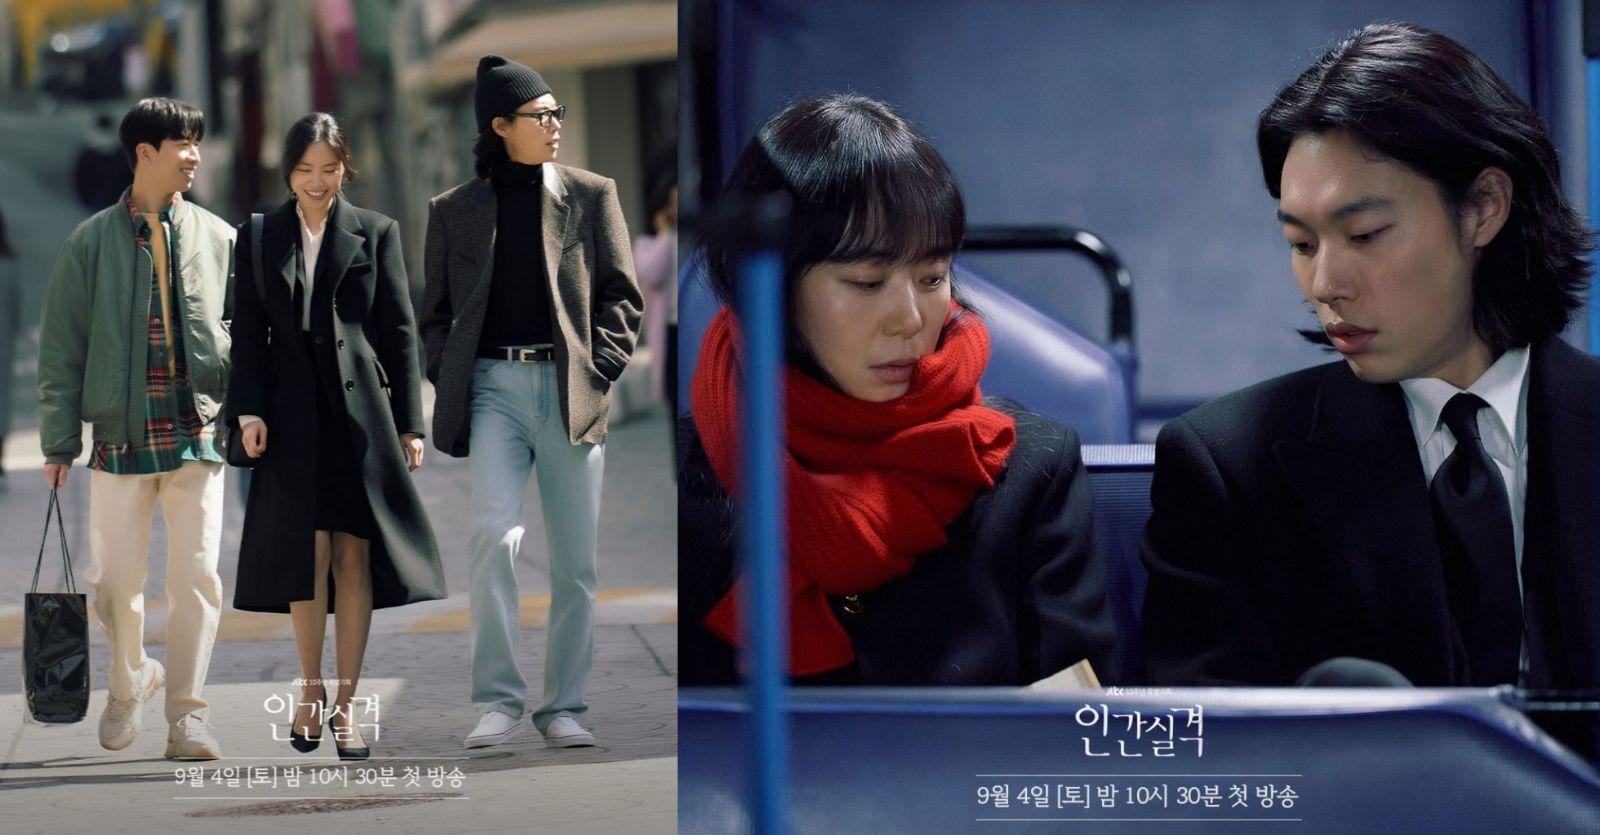 Drama Korea September 2021 - Lost